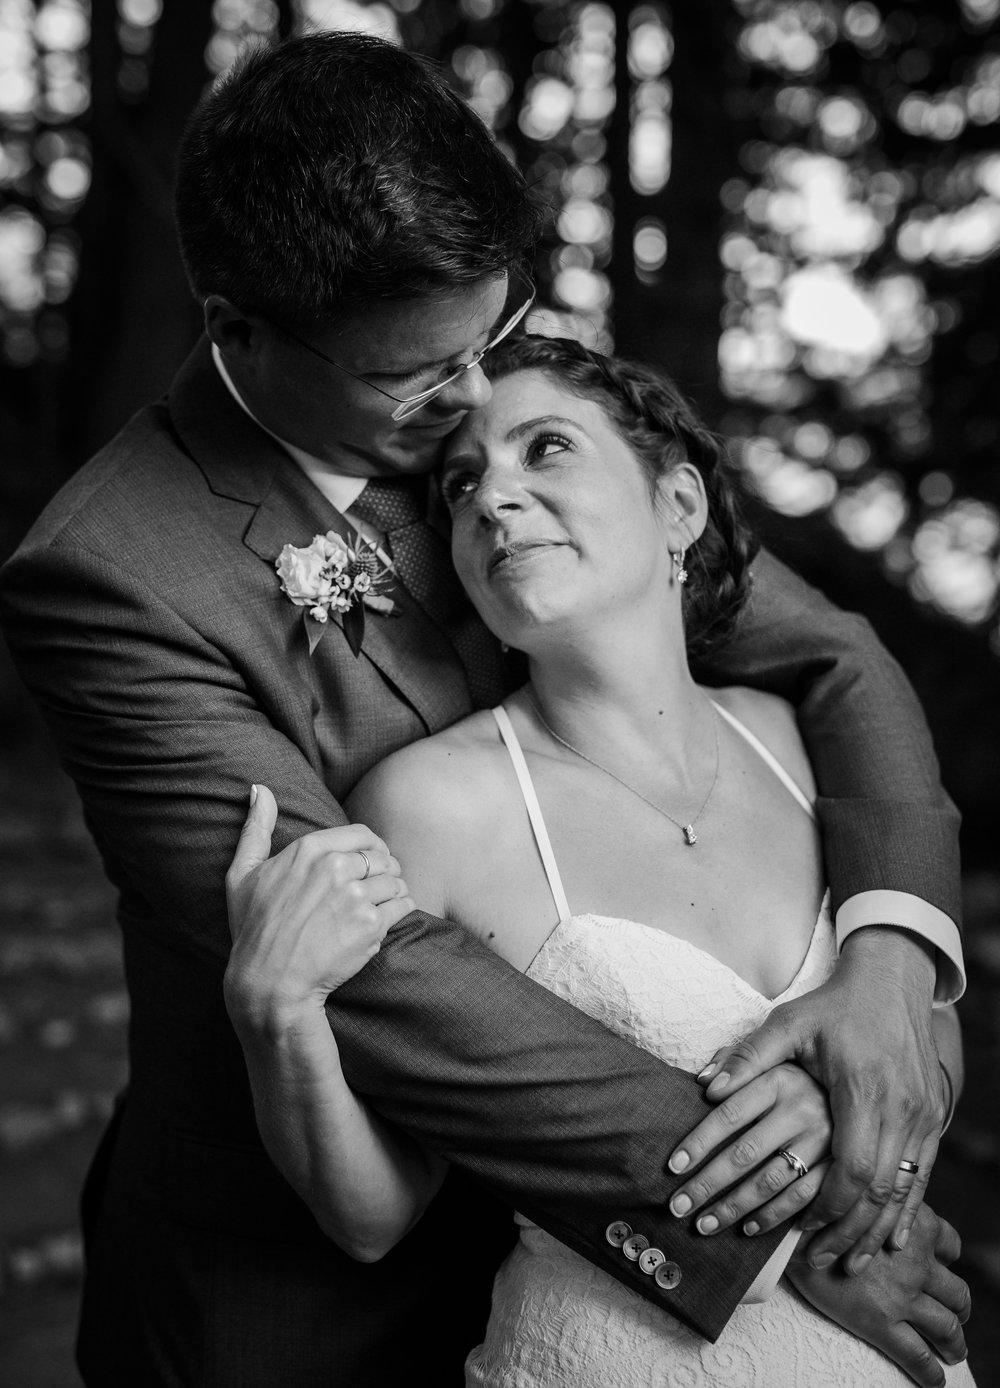 Camp Fircom Wedding - Vancouver Wedding Photographer & Videographer - Sunshine Coast Wedding Photos - Sunshine Coast Wedding Photographer - Jennifer Picard Photography - IMG_1180.jpg